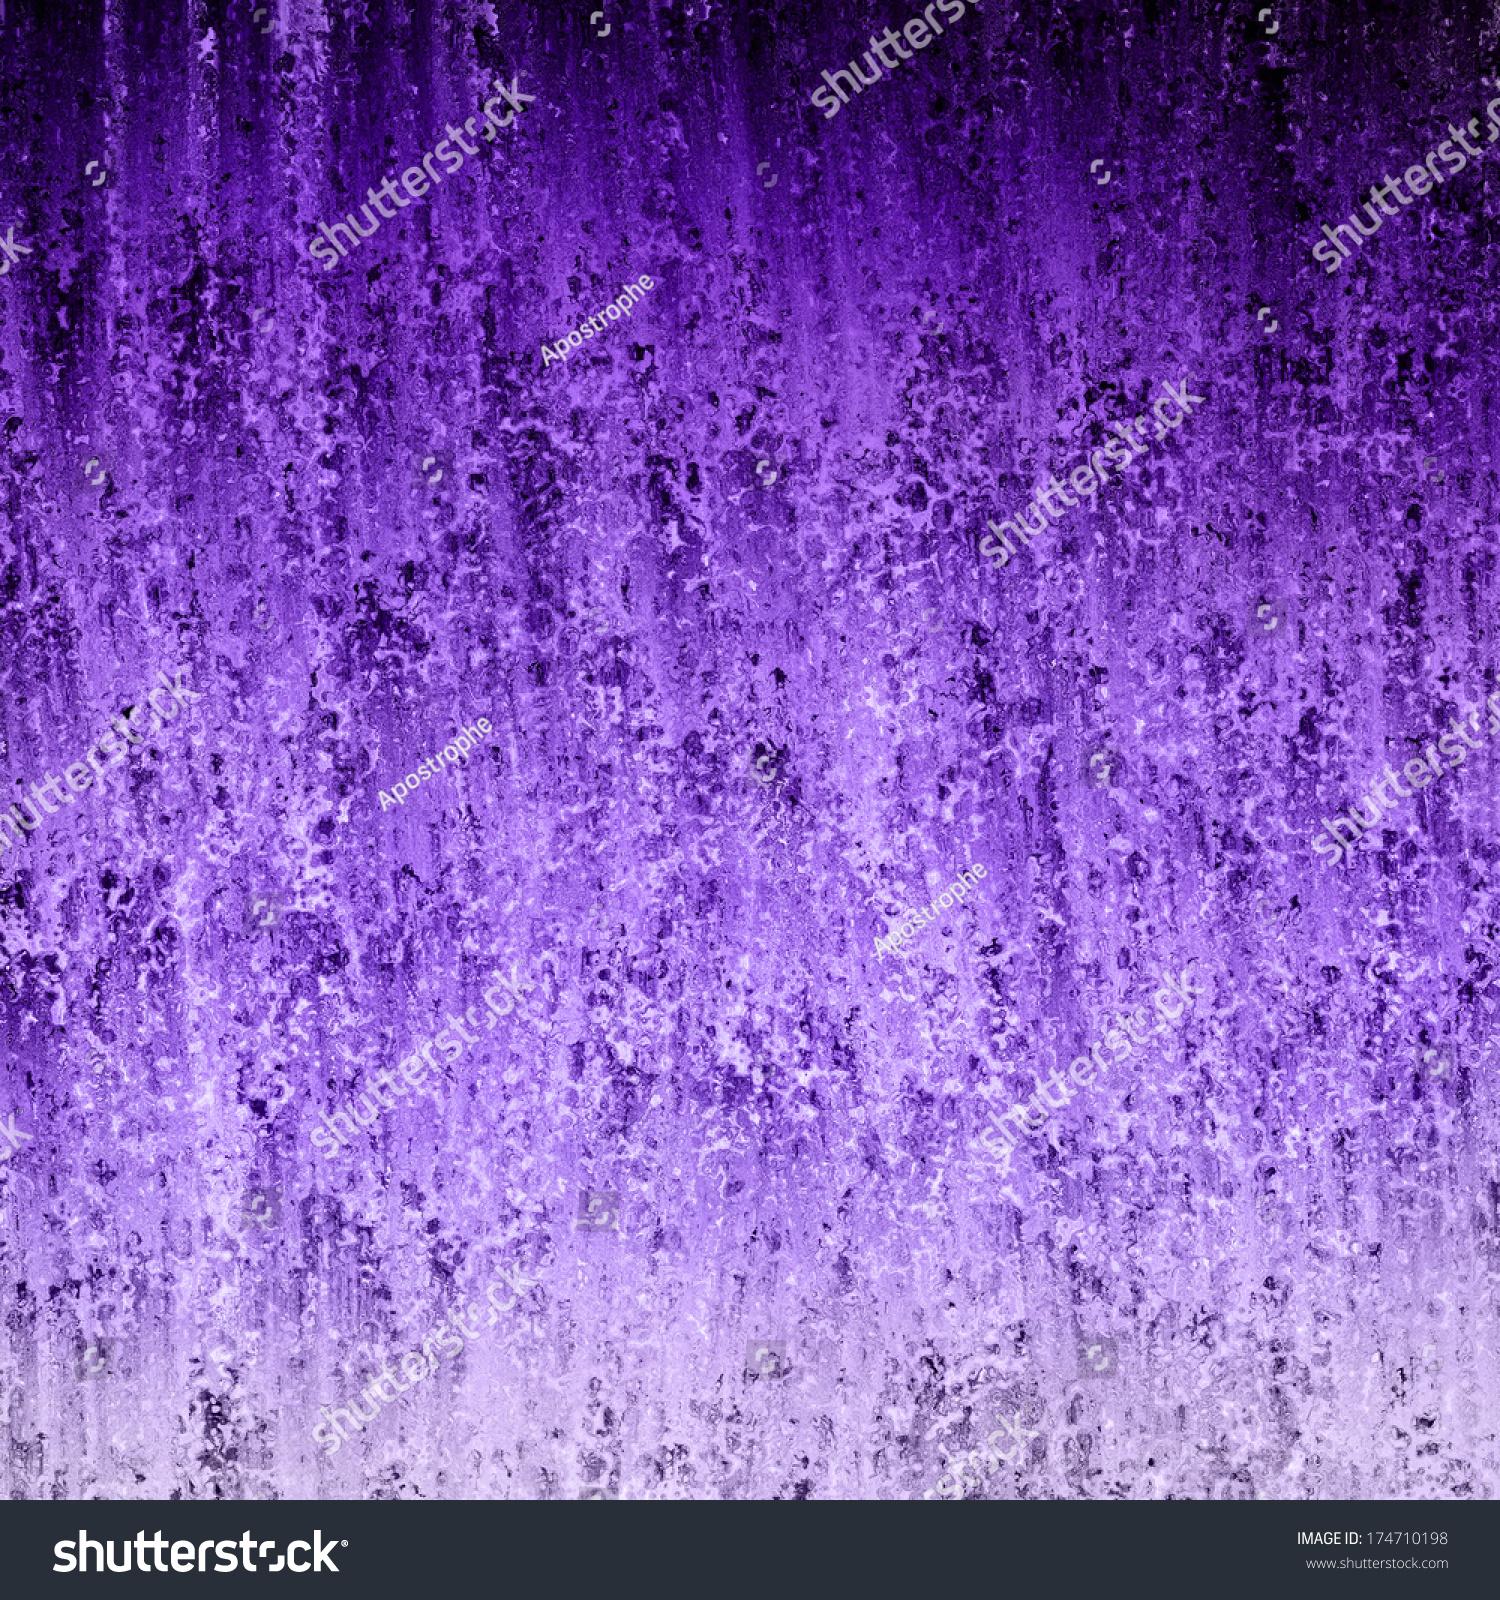 lavender background design - photo #34